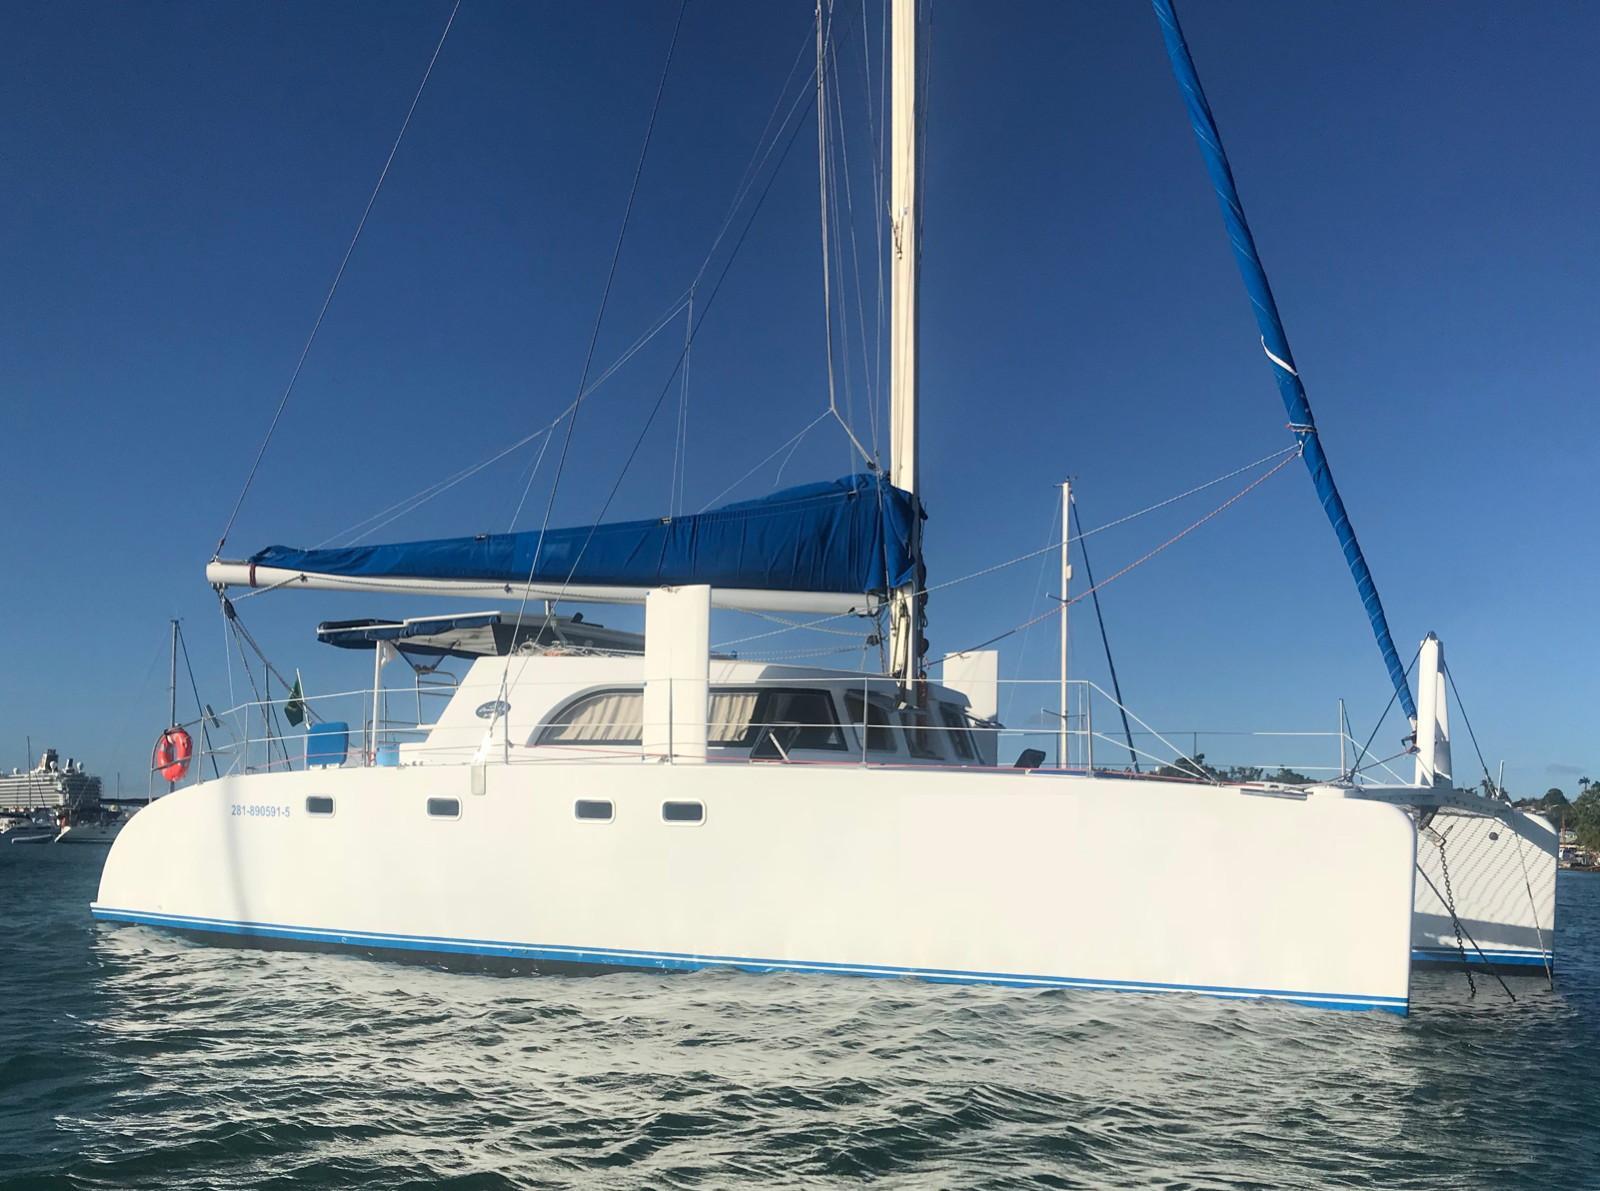 2013 Dolphin Ocema 42 Sail Boat For Sale Wwwyachtworldcom